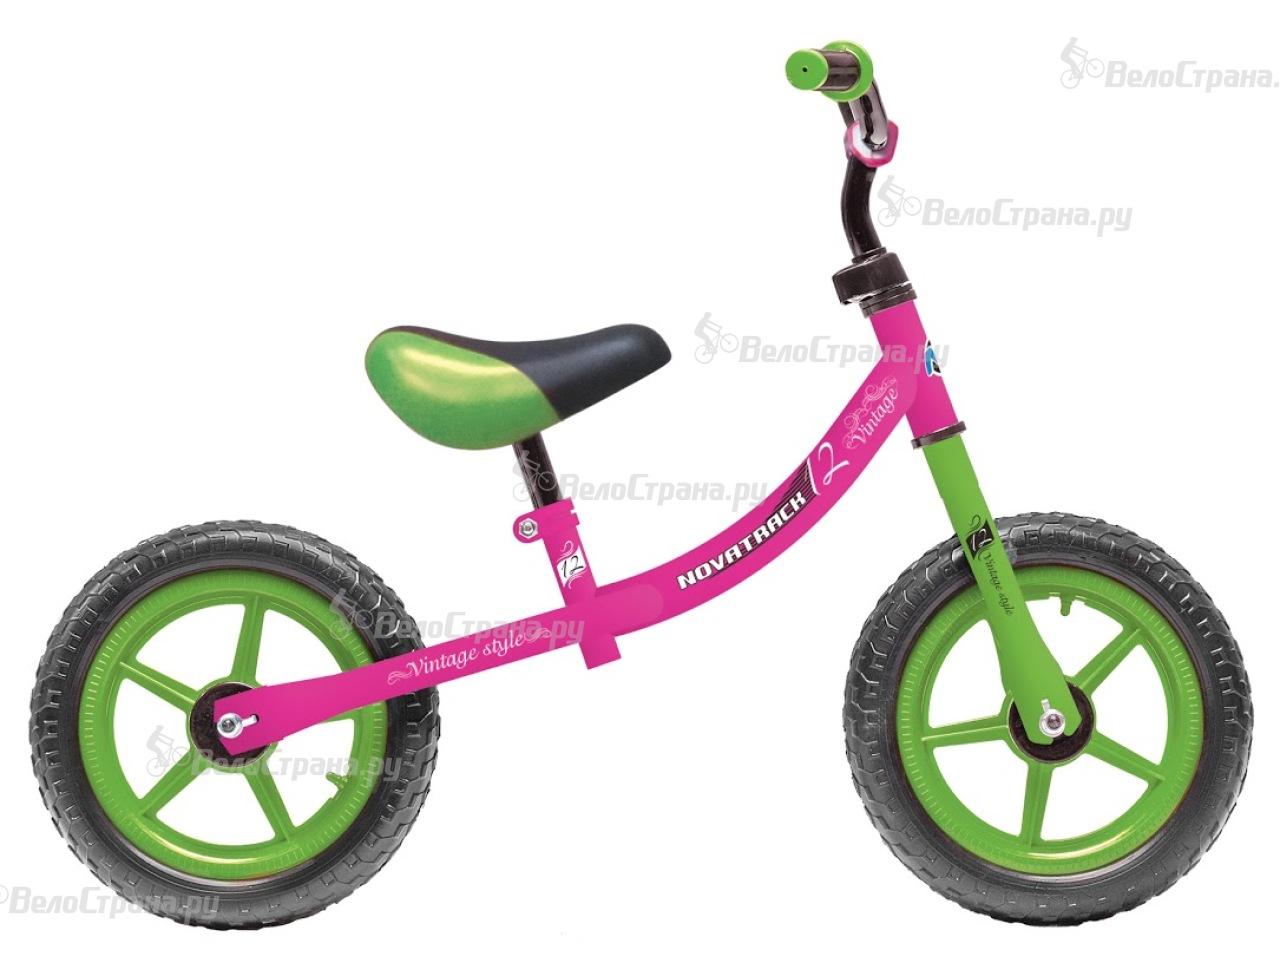 Велосипед Novatrack Vintage 12 (2016) велосипед novatrack delfi 2016